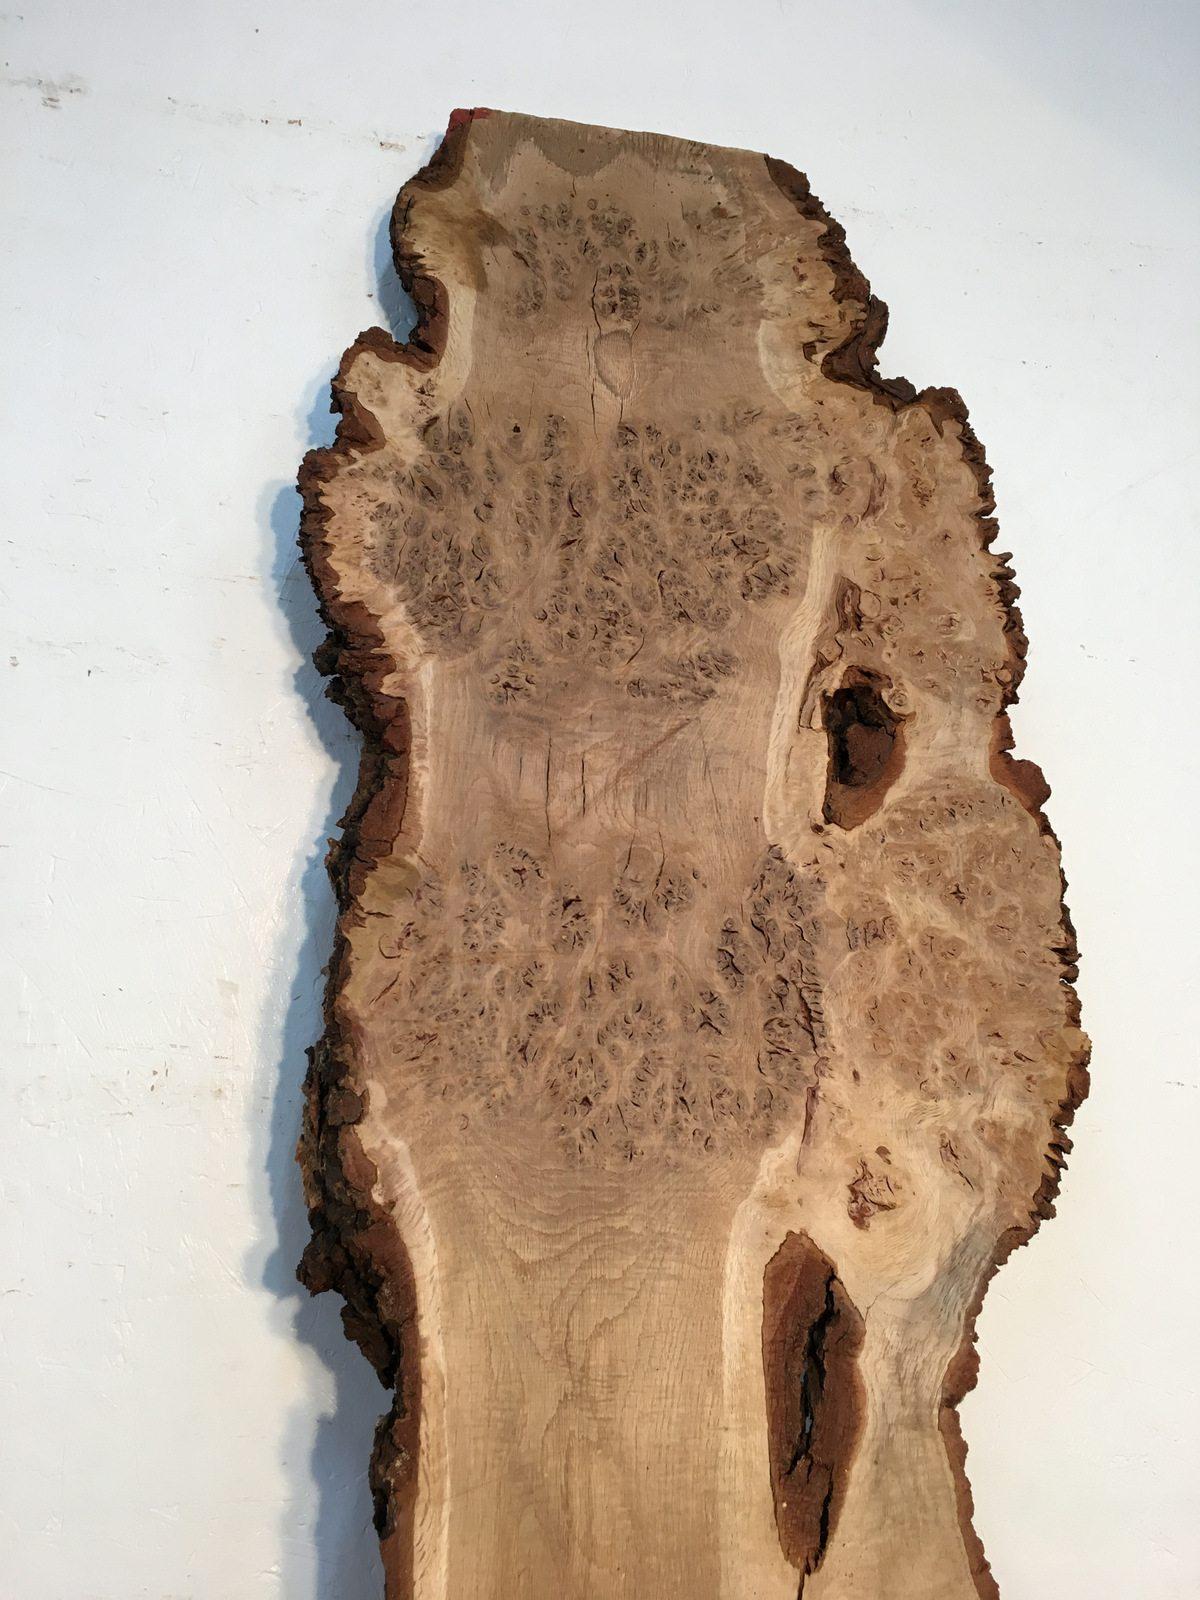 burr oak single women Burr oak ia demographics data with comparing the median age of men versus women in figure 7 we find that burr oak indicates median age of men compares as.